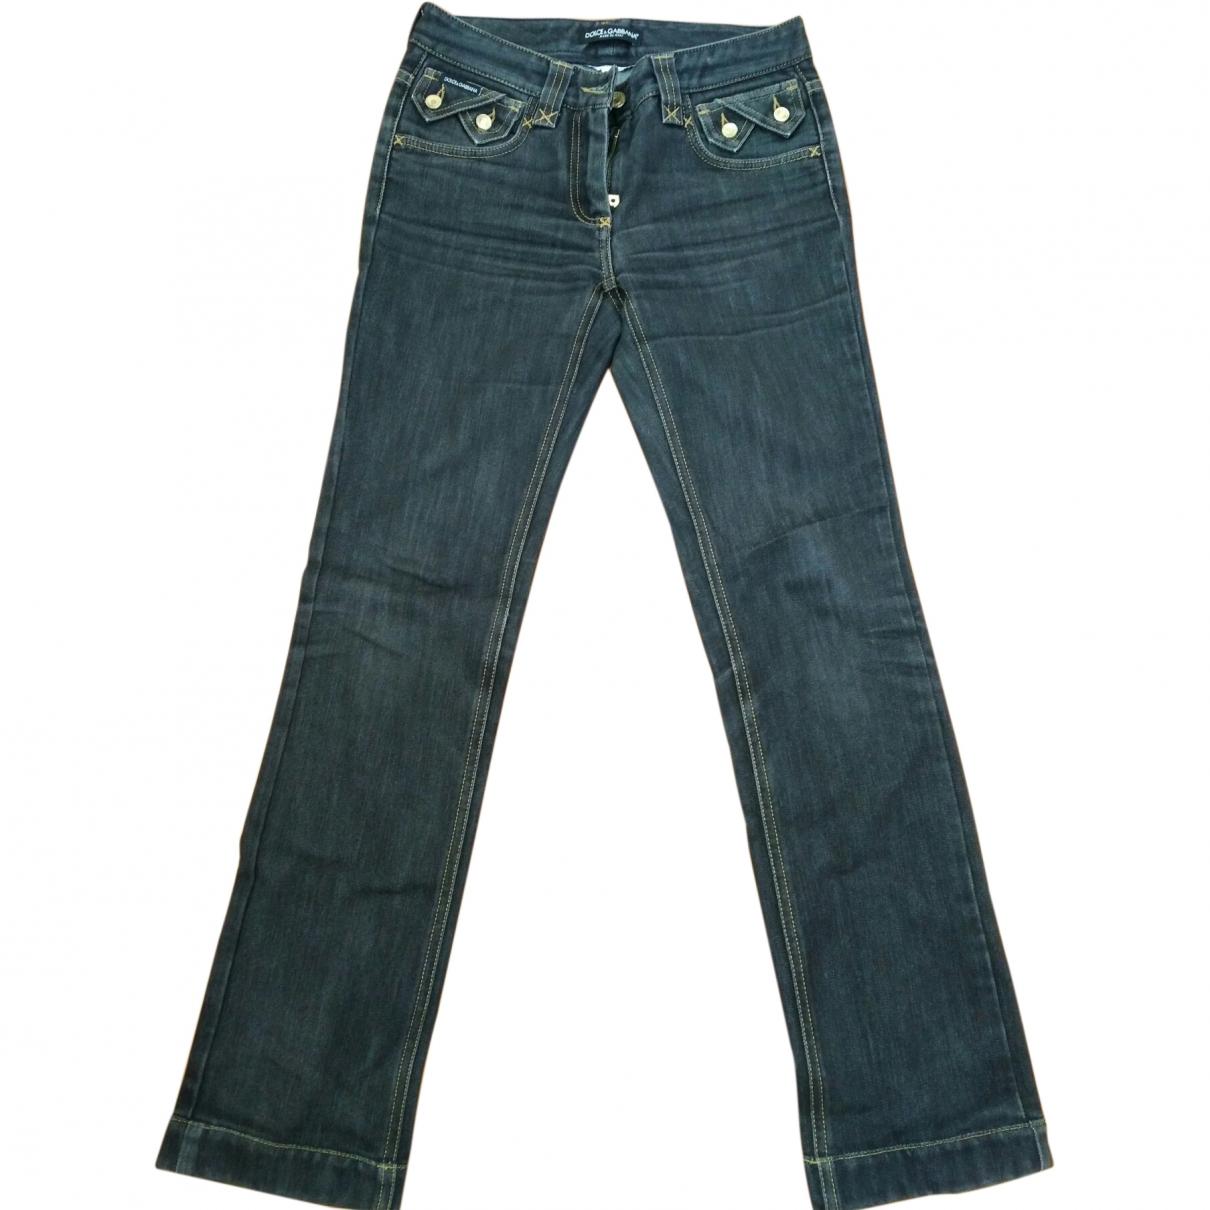 Dolce & Gabbana \N Black Denim - Jeans Jeans for Women 38 FR